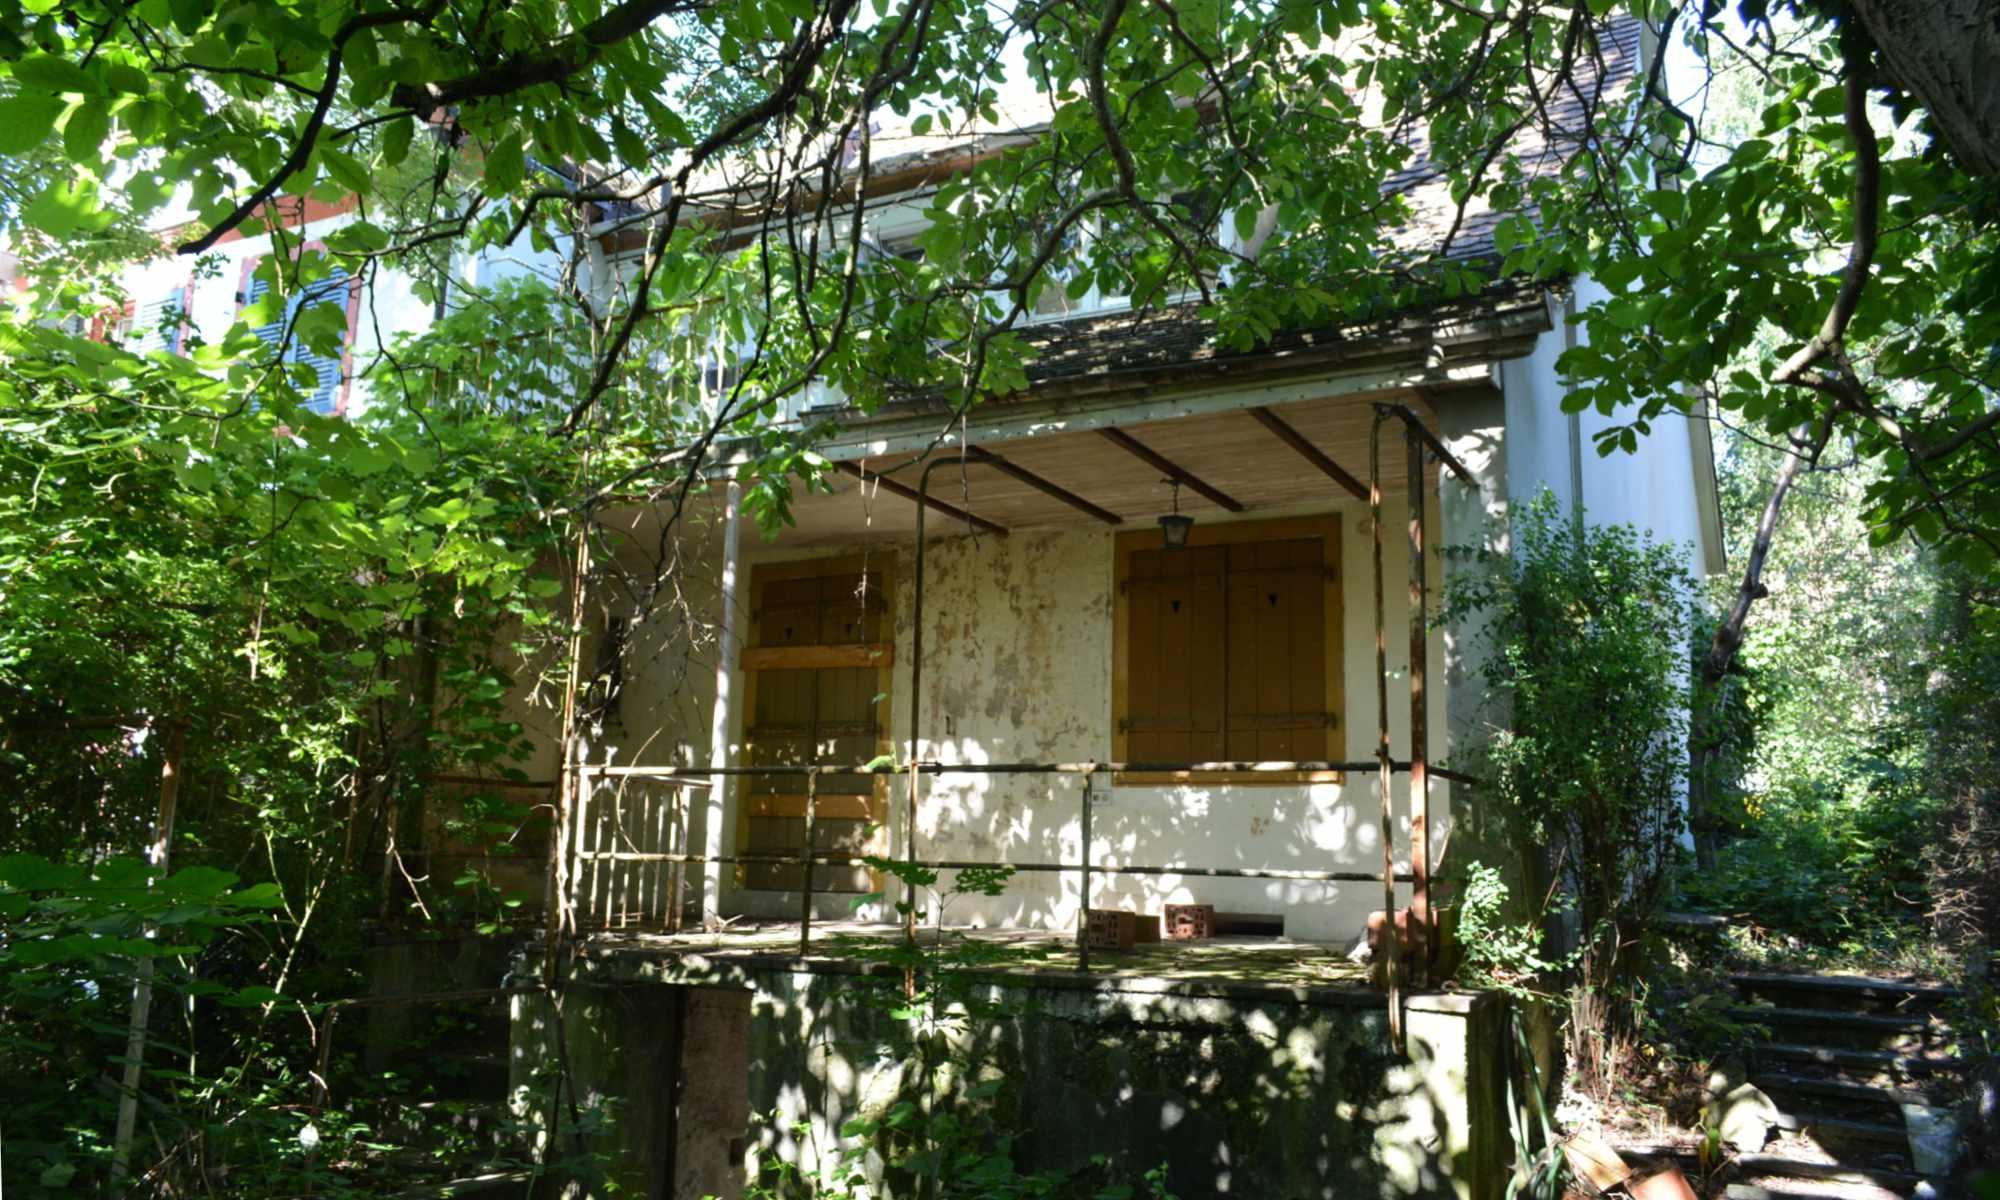 Geisterhaus, verlassener Ort, verlassenes Haus, lost place